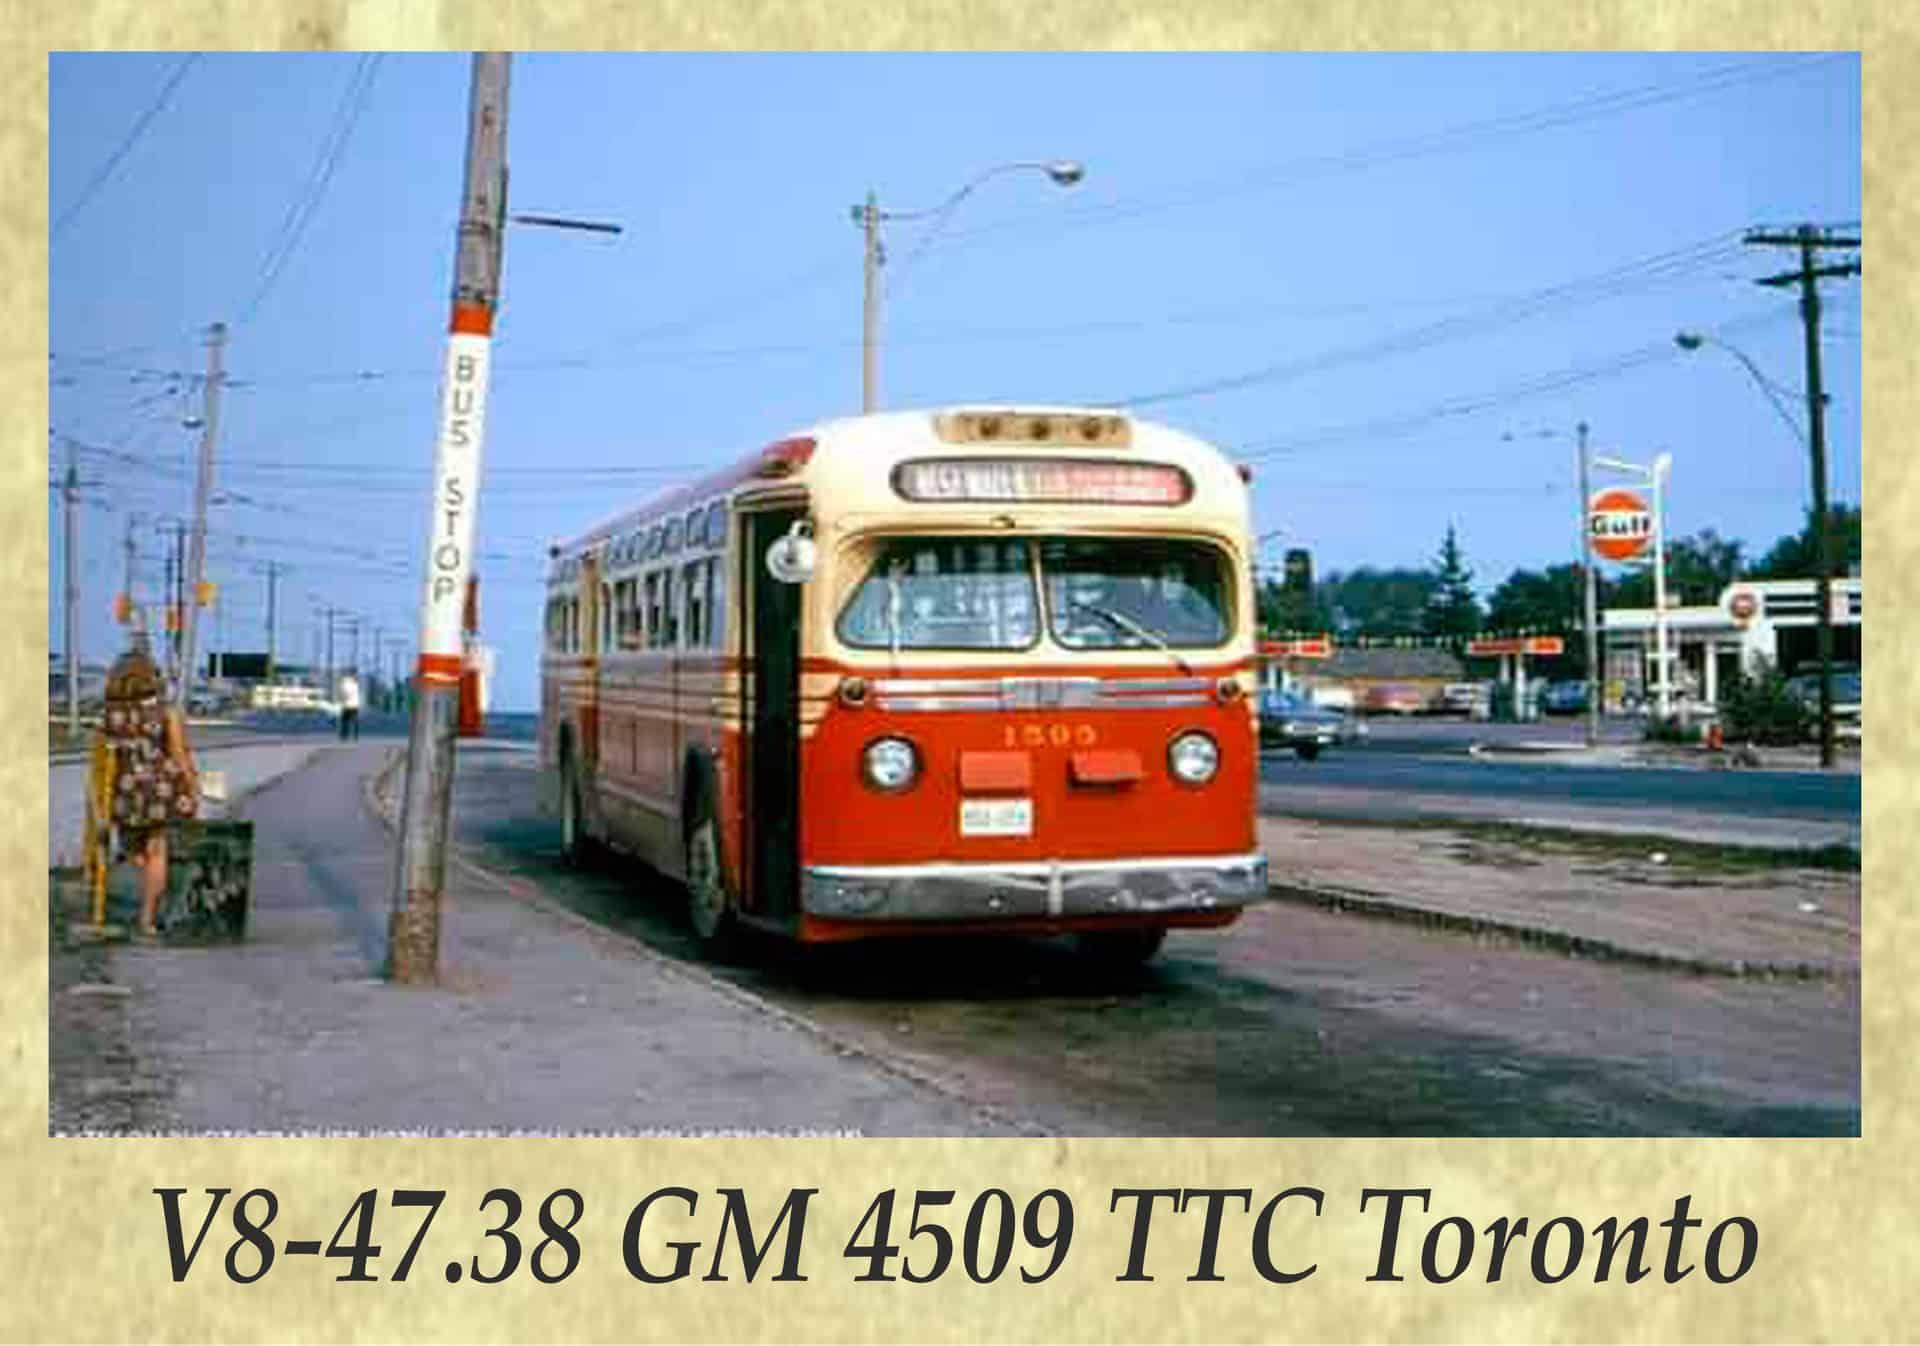 V8-47.38 GM 4509 TTC Toronto